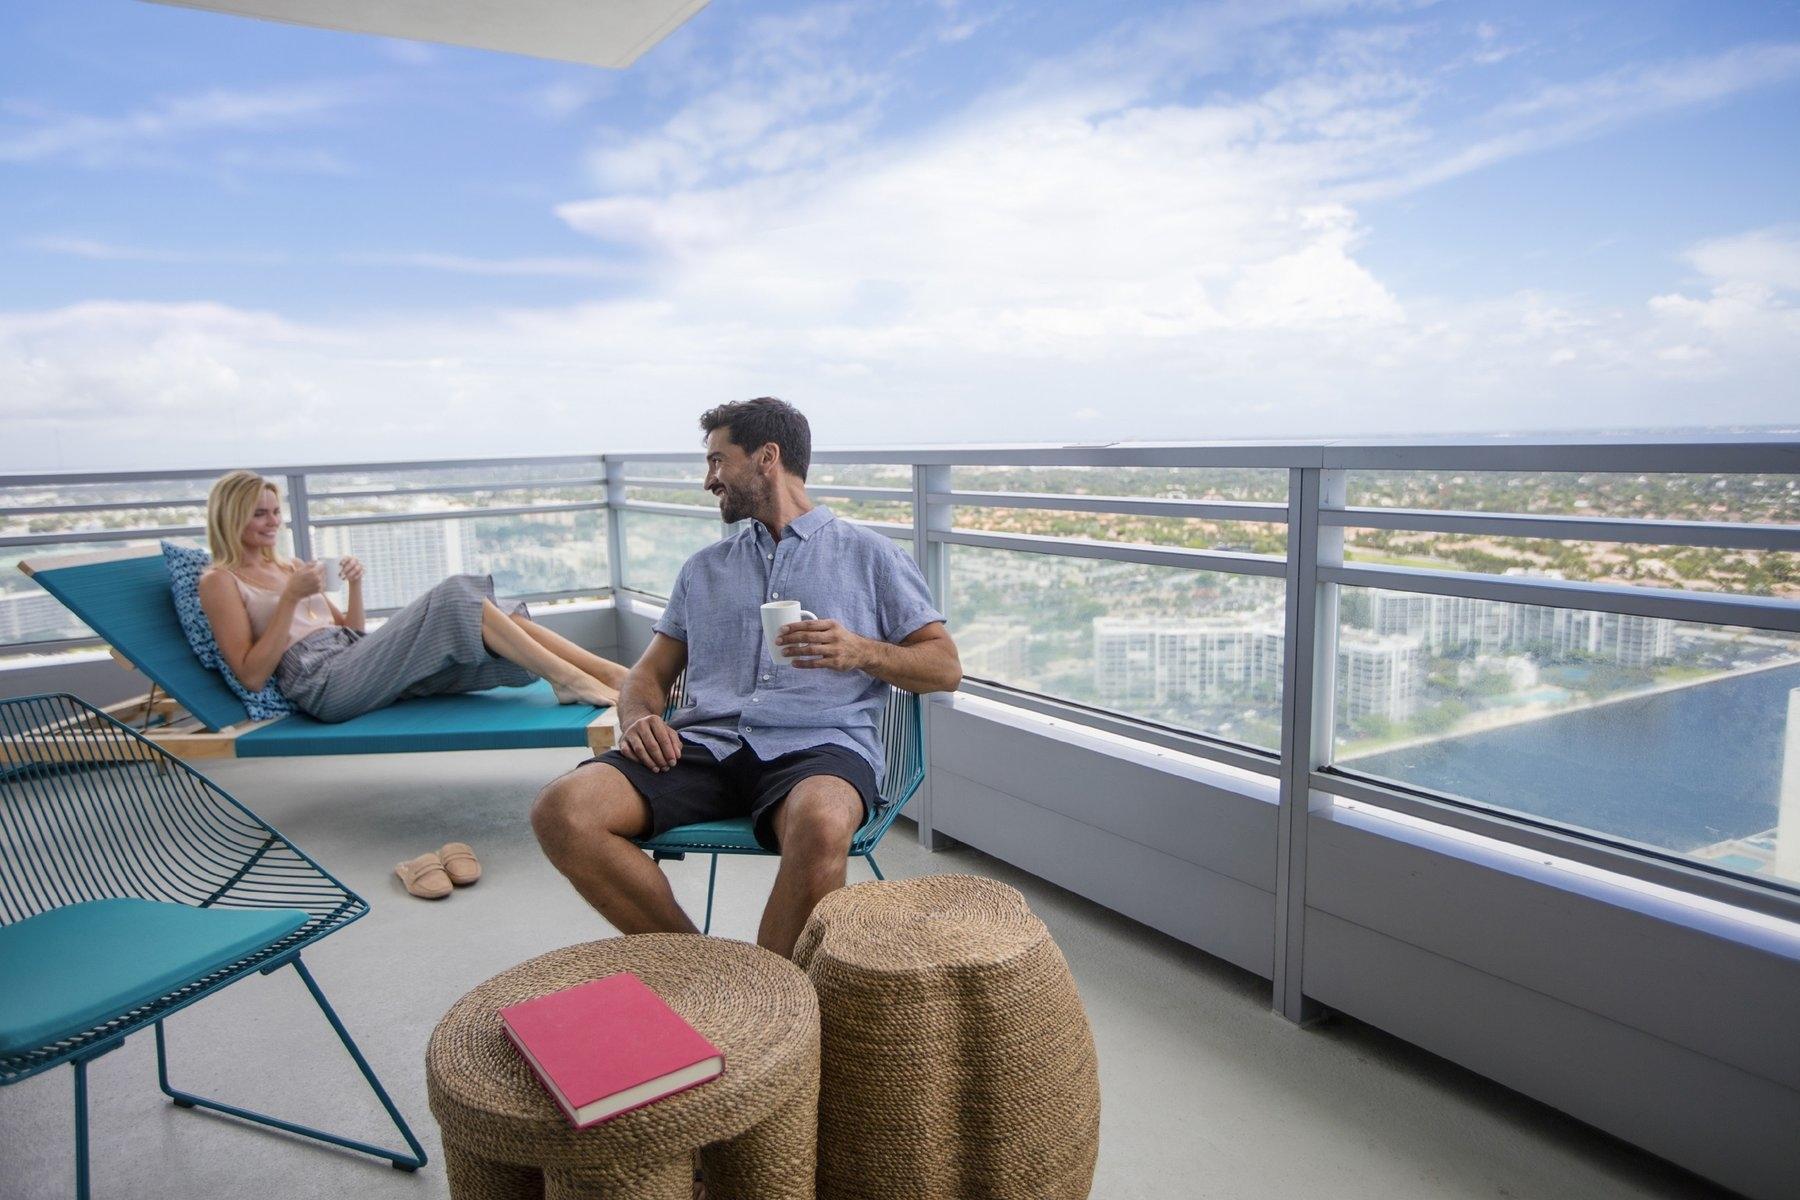 Balcony Couple